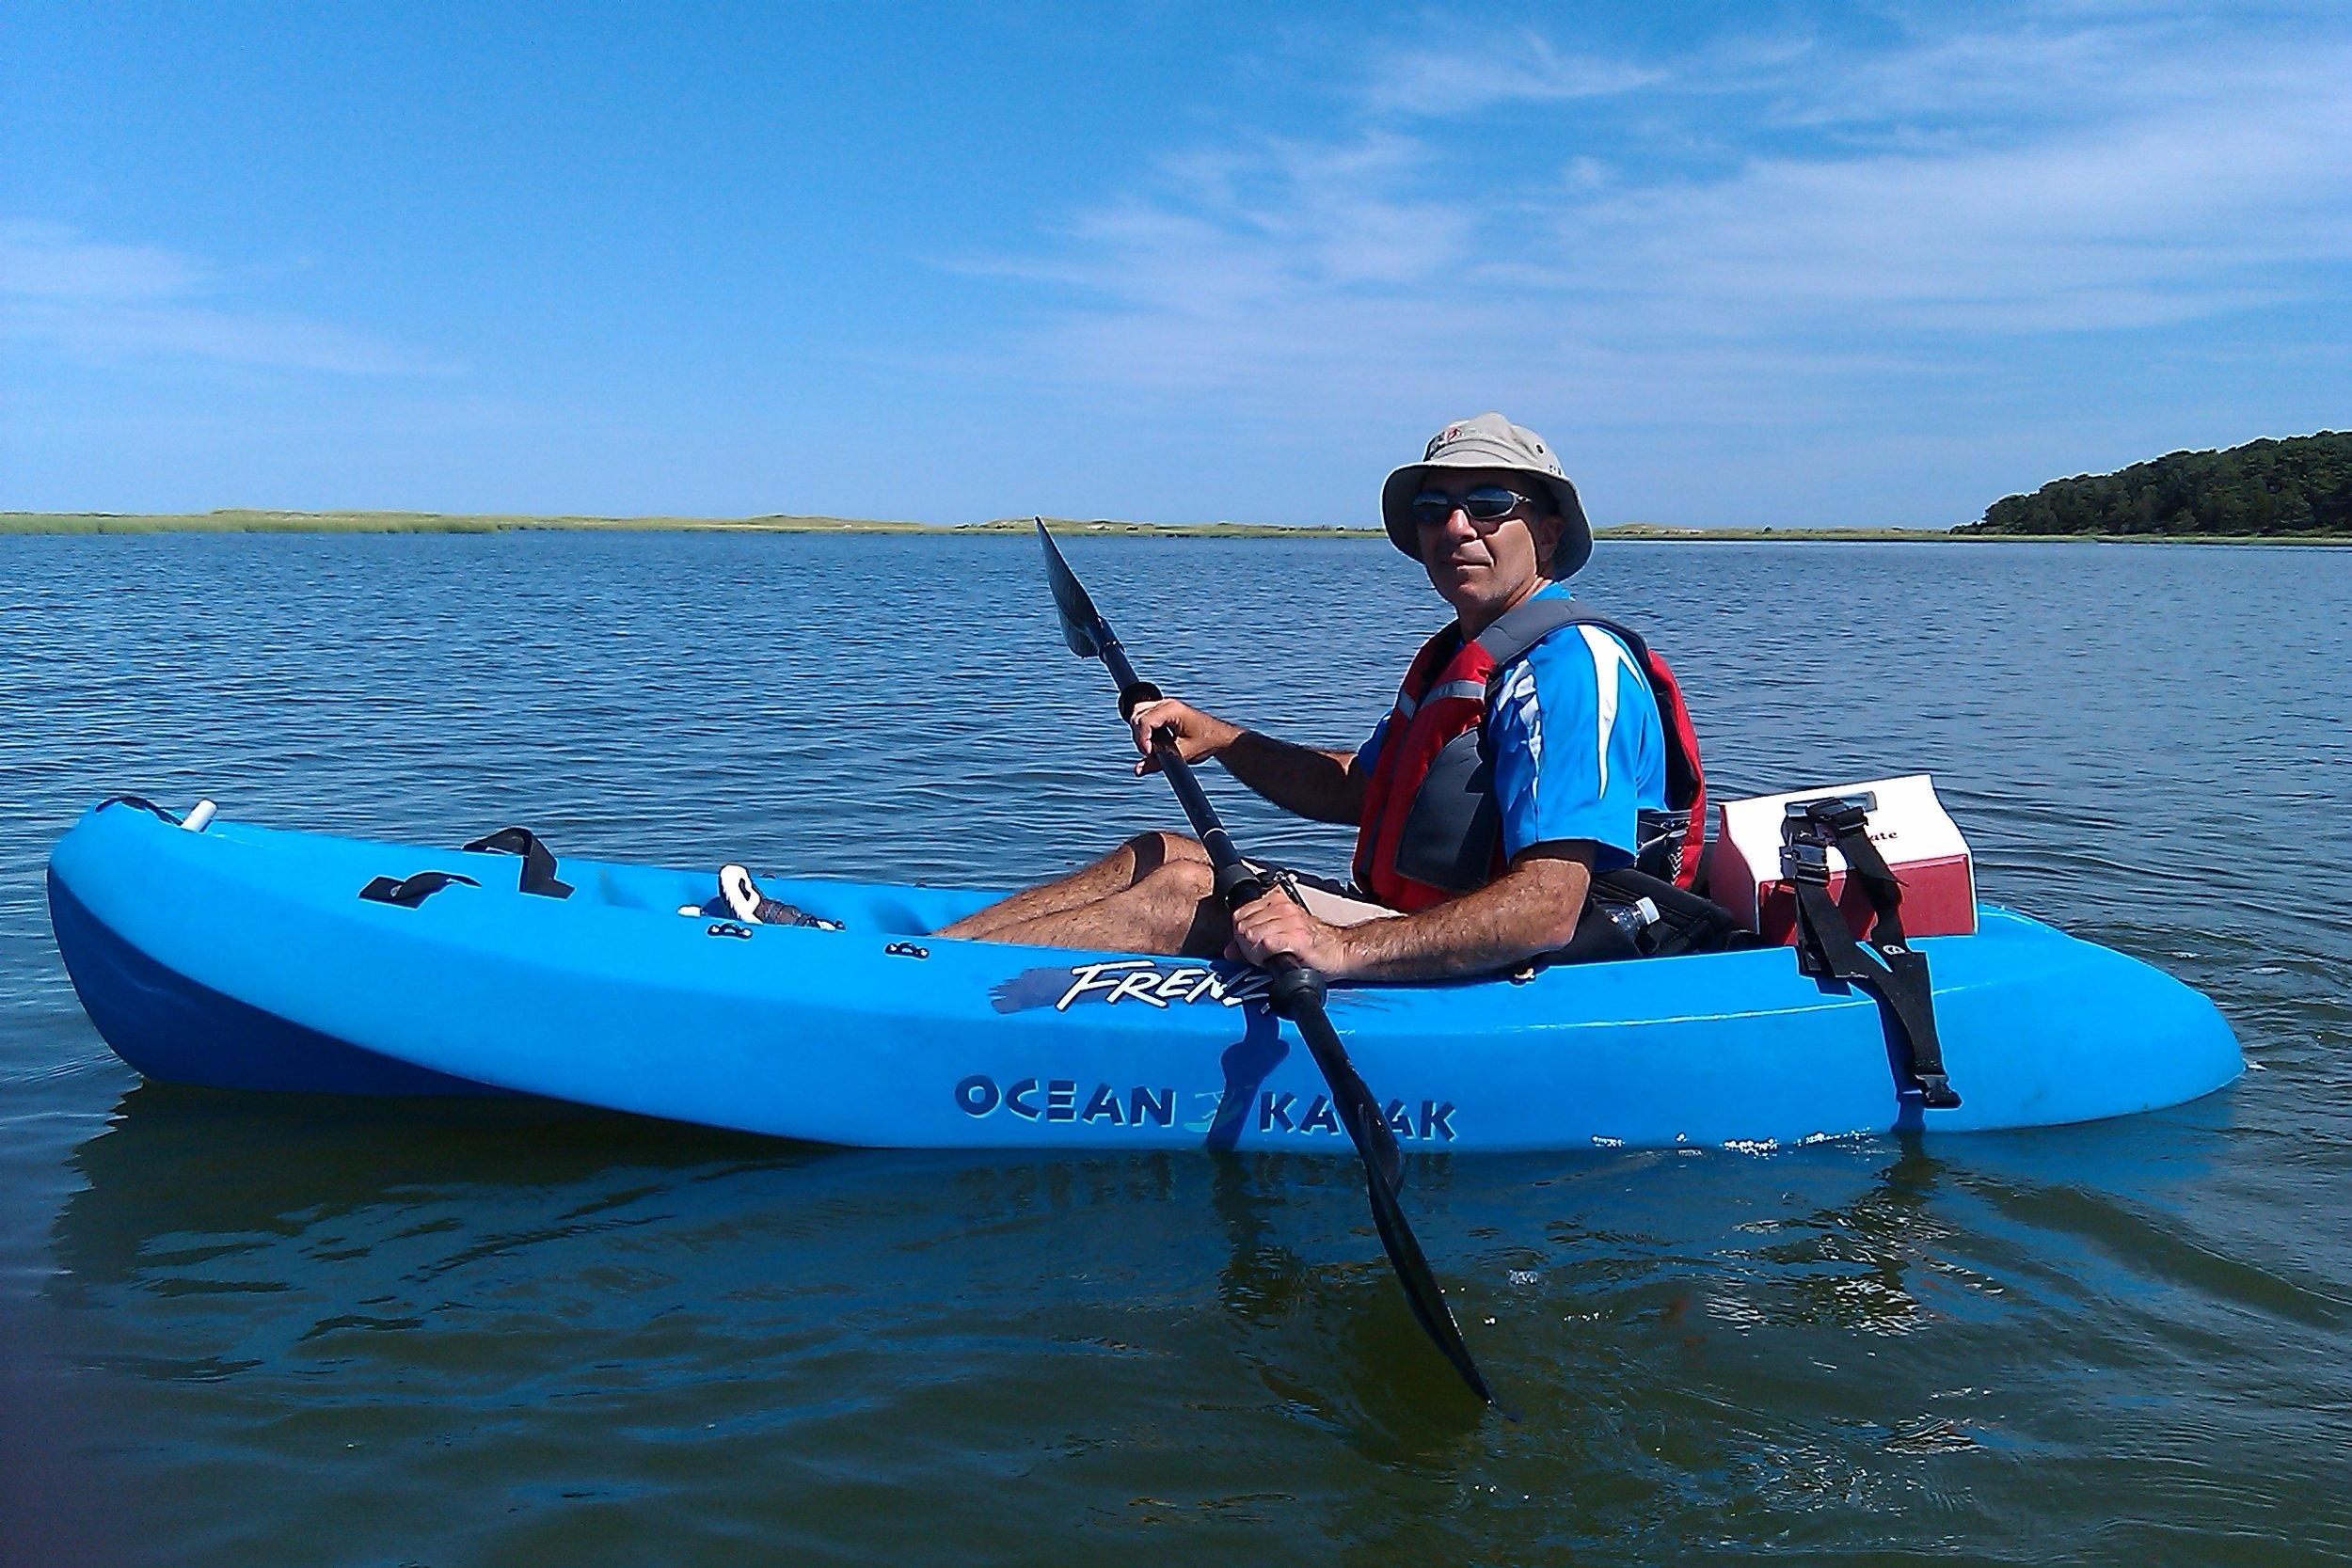 Ed in kayak 2 7-2010.jpg